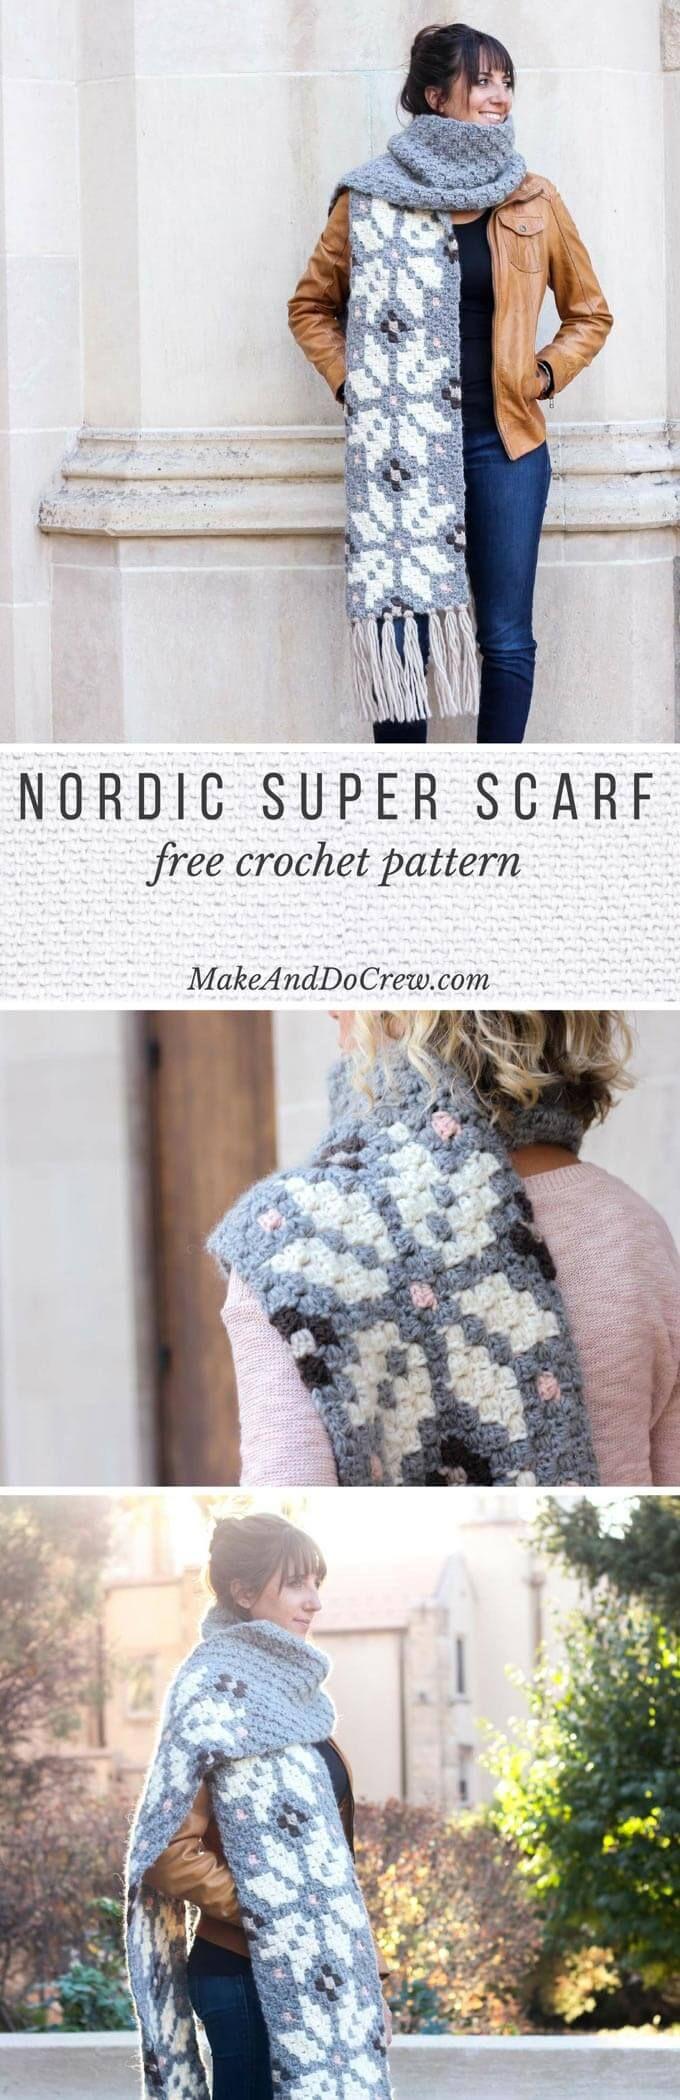 Free Nordic Crochet Super Scarf Pattern | Crochet bufanda, Chal y Tejido